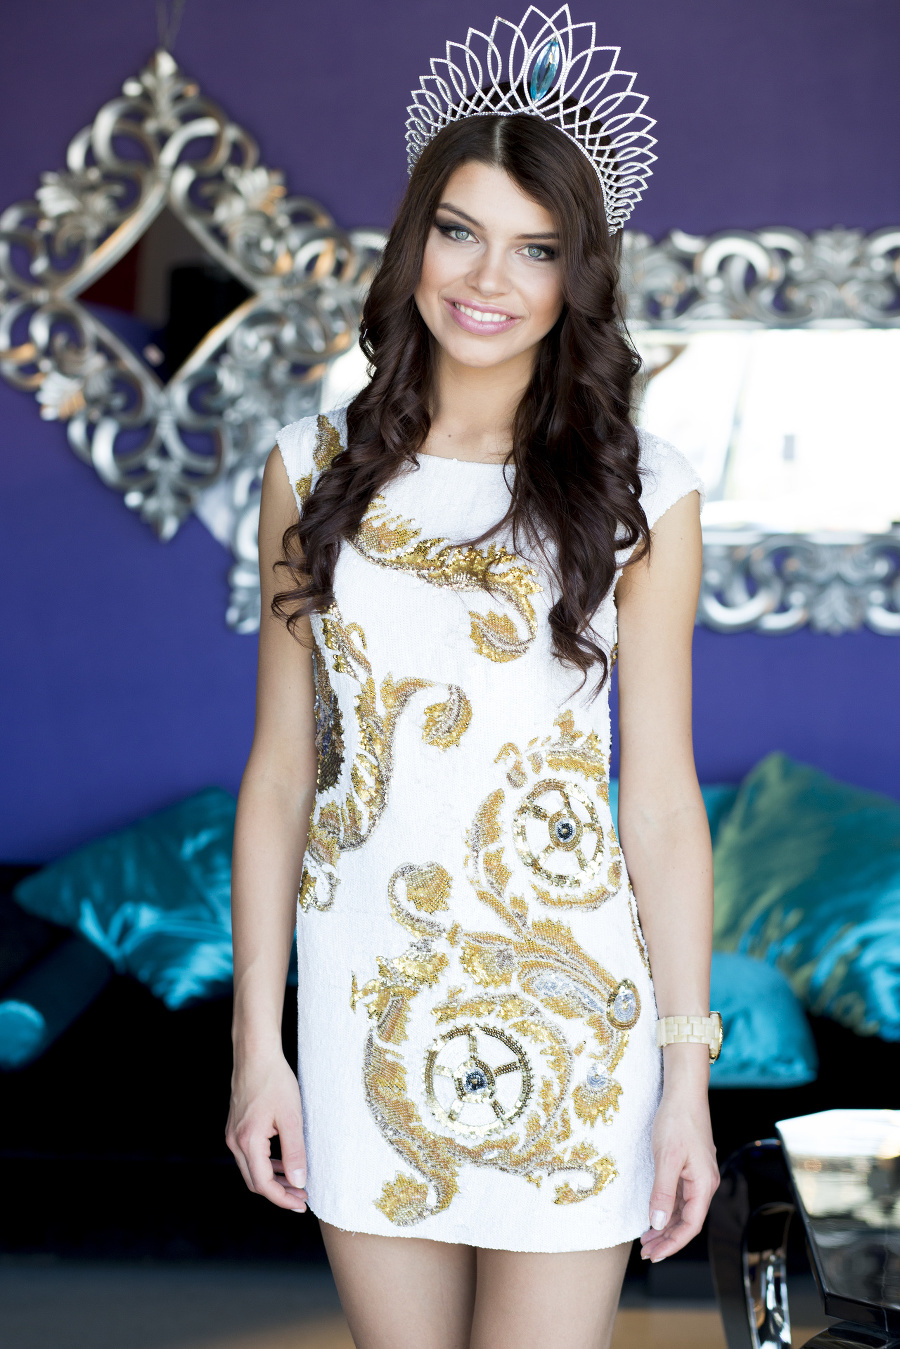 Karolína Chomisteková (23), Miss